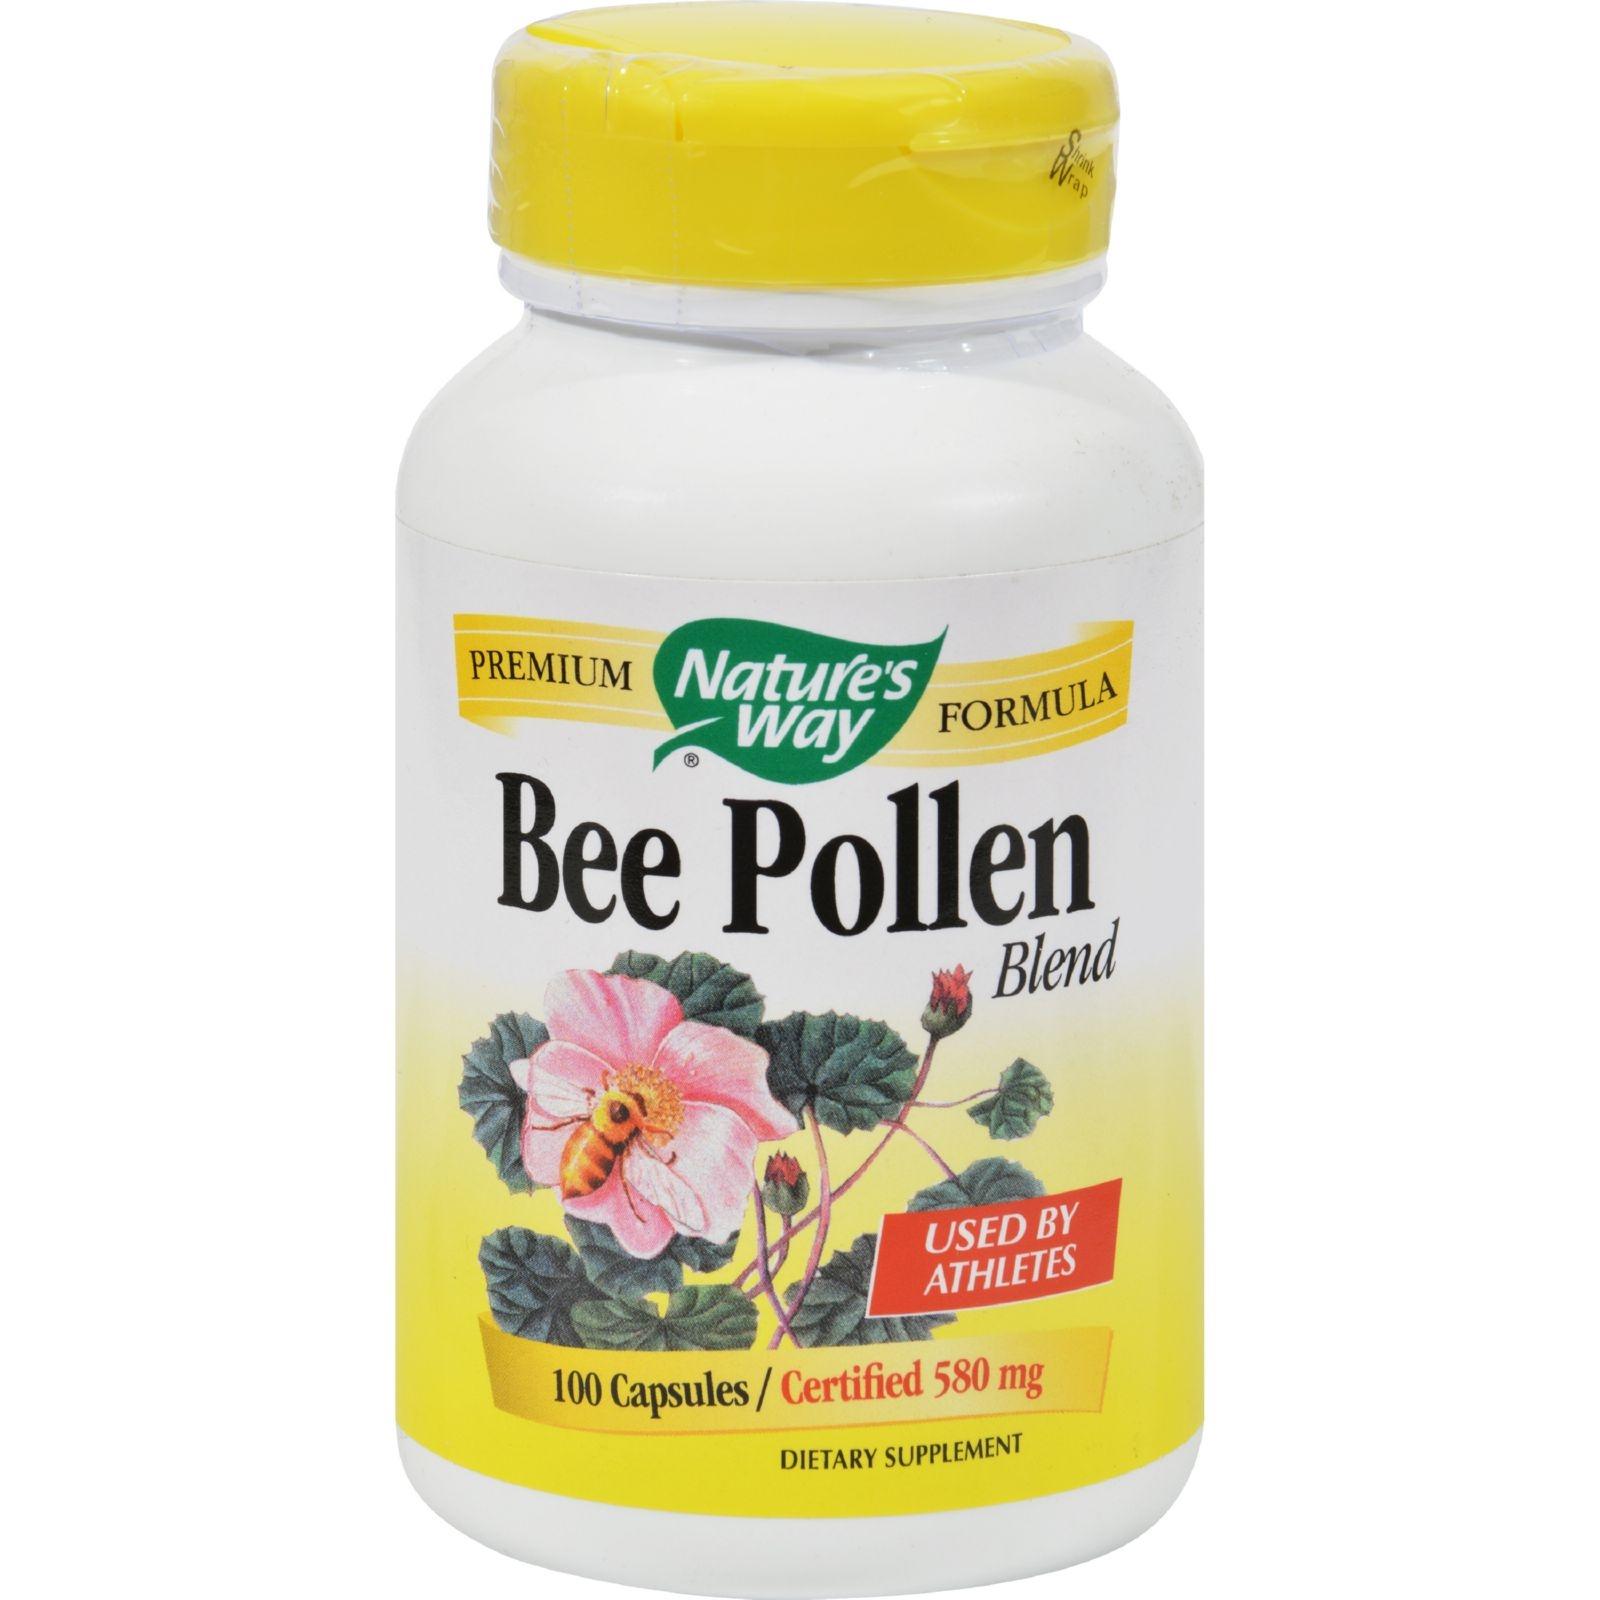 Nature's Way Bee Pollen Blend - 100 Capsules